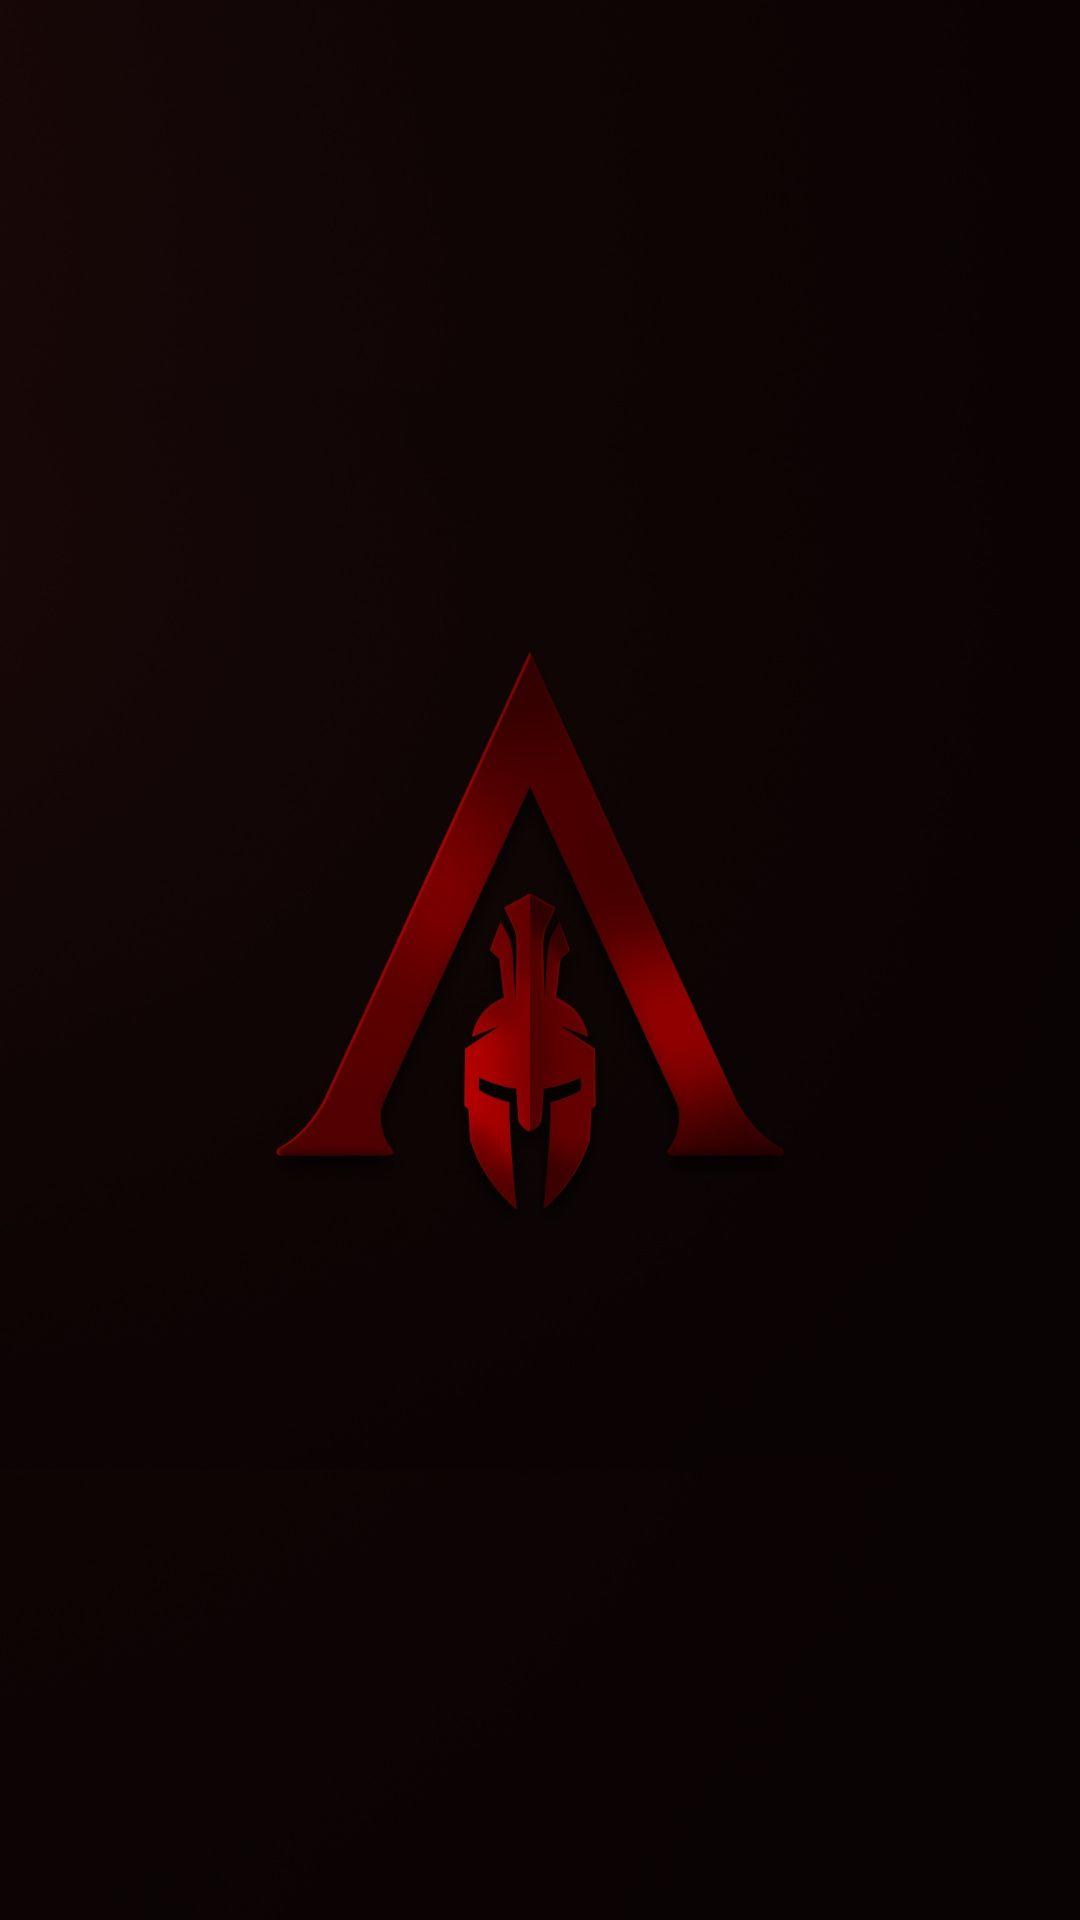 Spartan Helmet Wallpaper : spartan, helmet, wallpaper, Assassin's, Creed, Odyssey,, Spartan,, Minimal,, 1080x1920, Wallpaper, Assassins, Creed,, Wallpaper,, Warriors